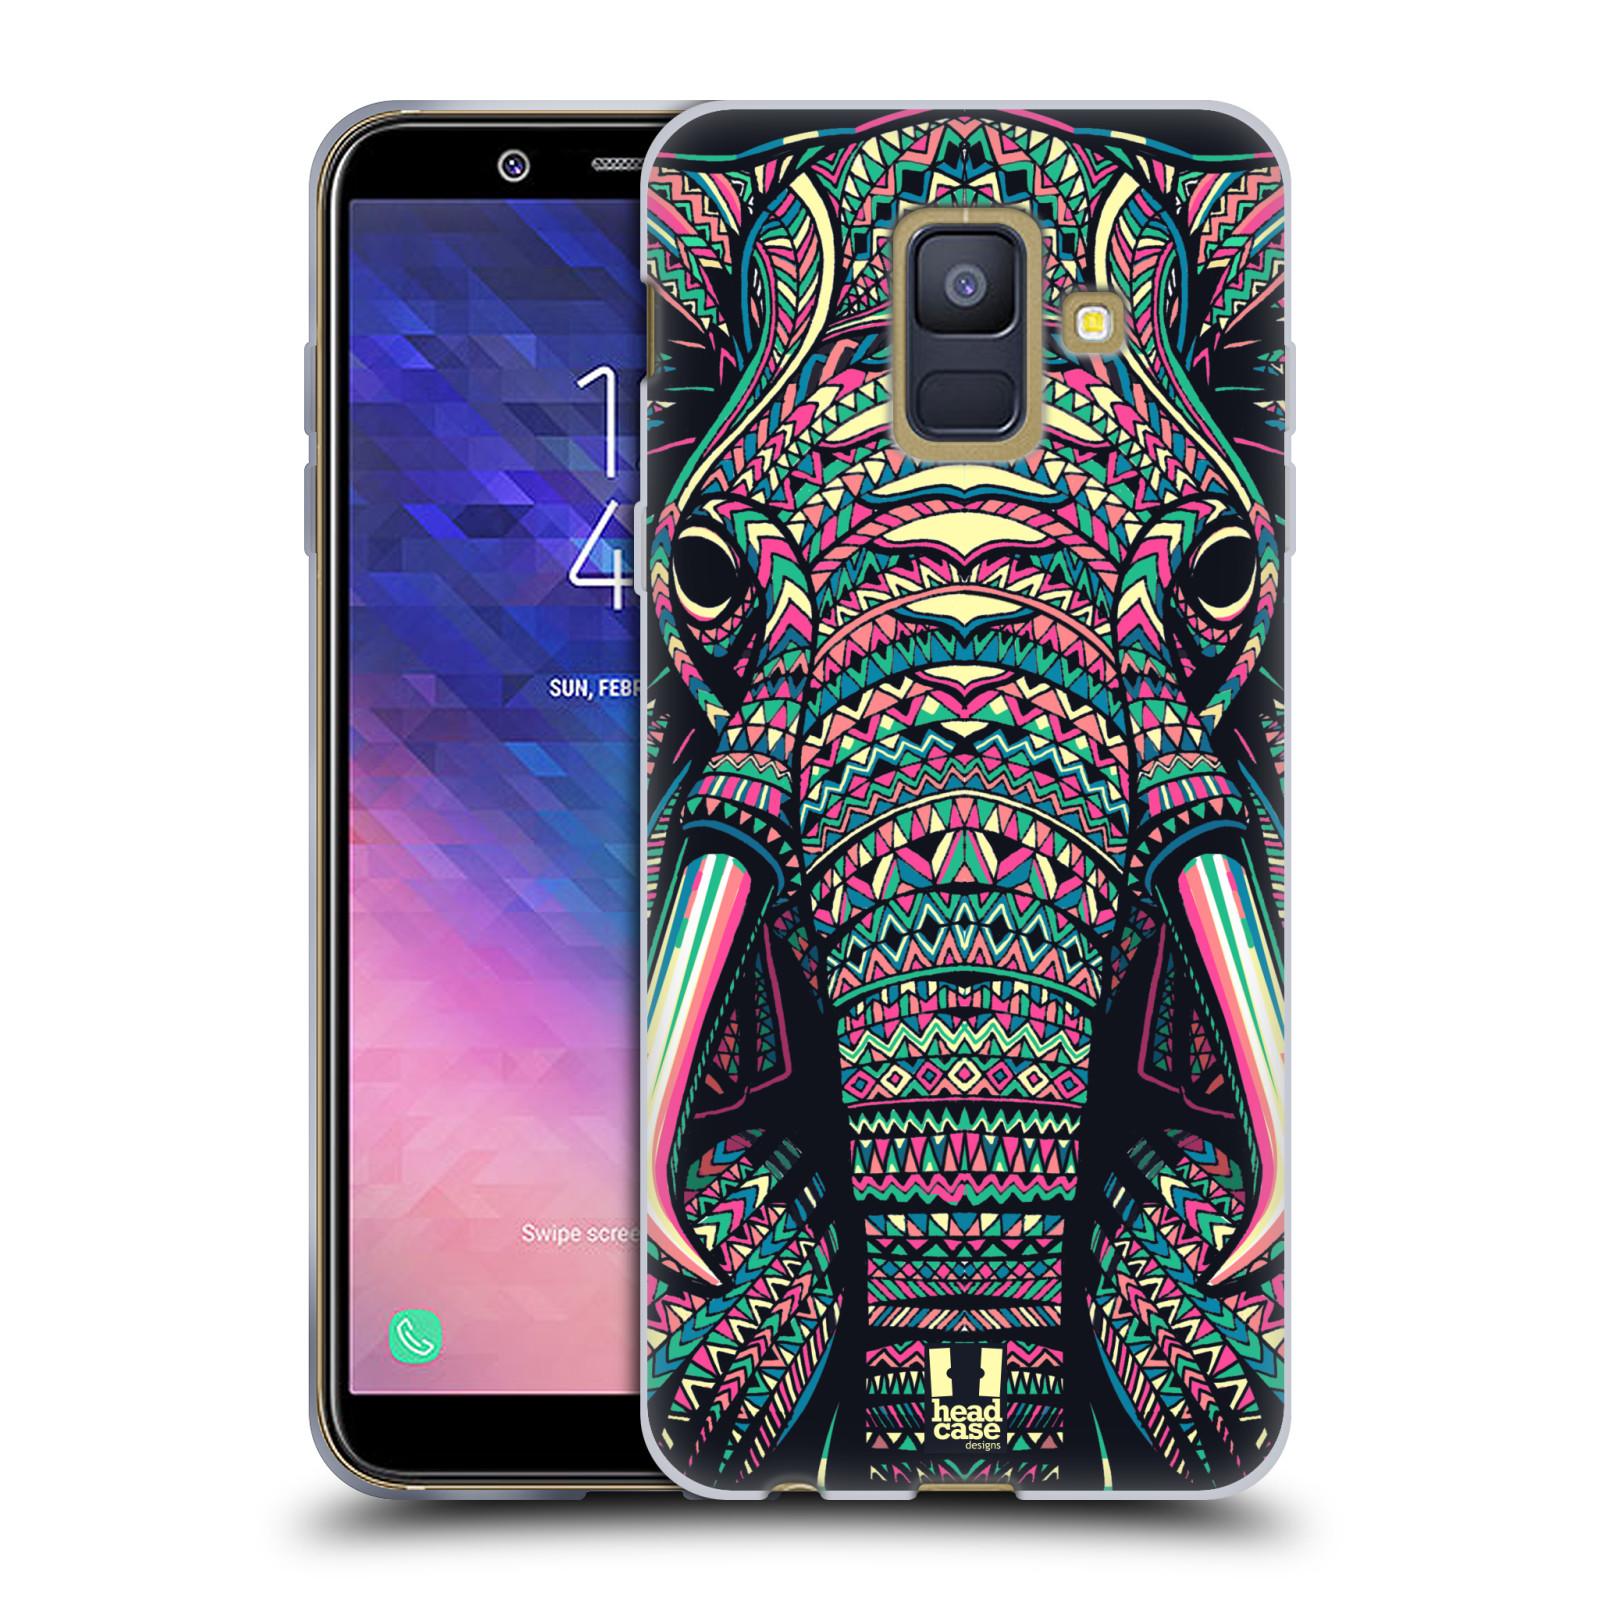 Silikonové pouzdro na mobil Samsung Galaxy A6 (2018) - Head Case - AZTEC SLON